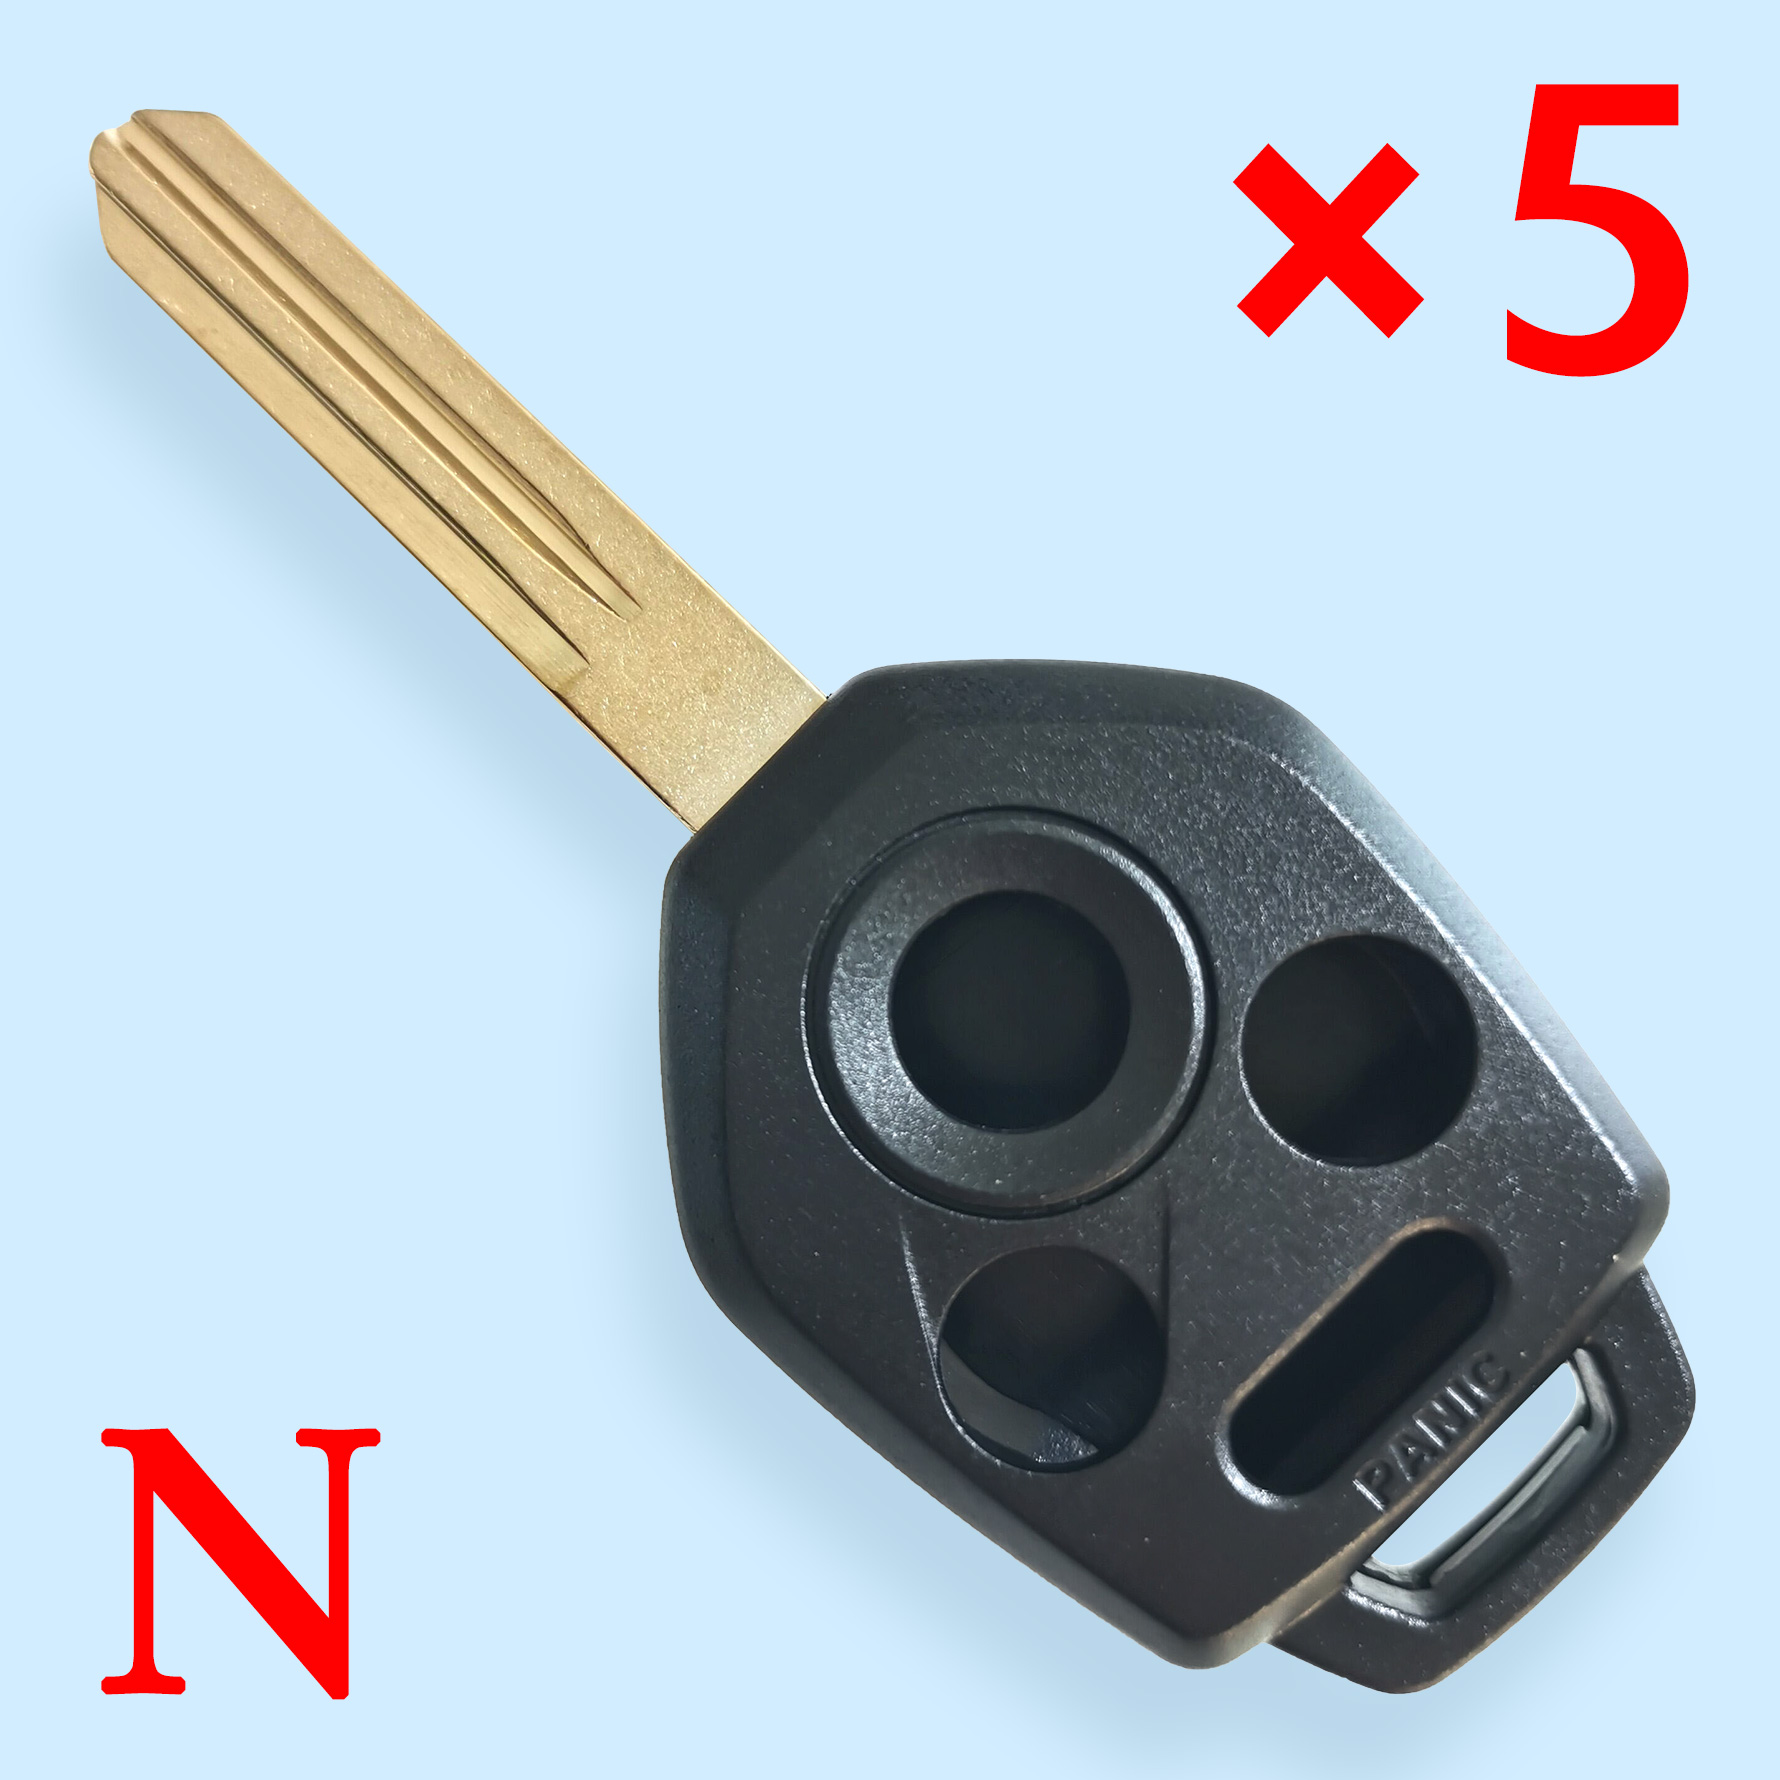 2008-2014 Subaru 4-Button Remote Head Key SHELL Replacement For CWTWB1U811 & CWTWBU766 / DA34 - Pack of 5